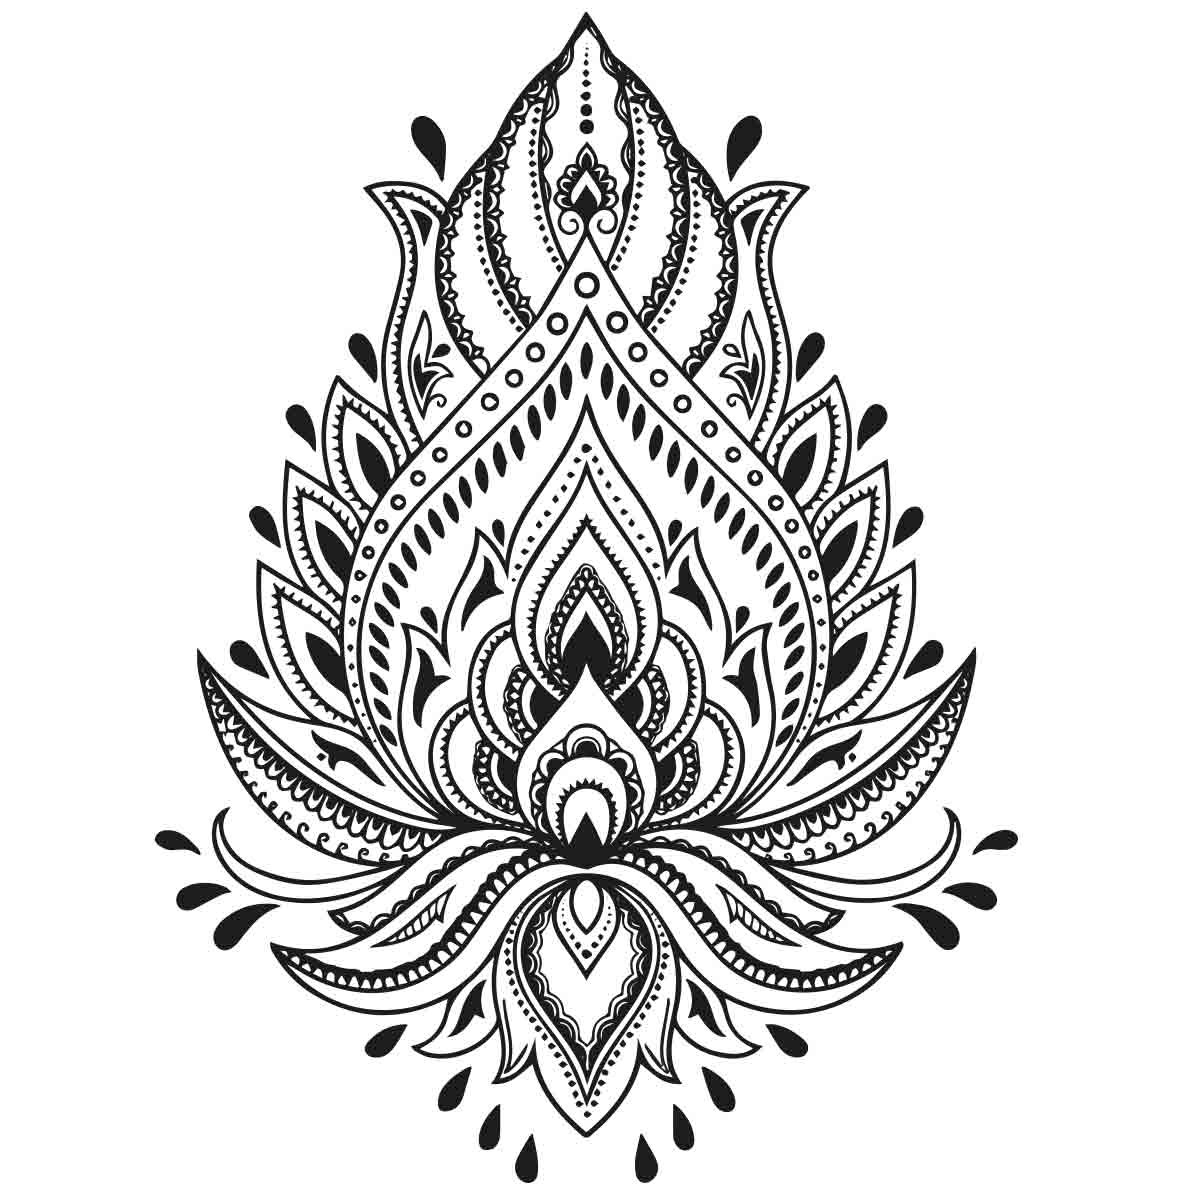 Coloriage Mandala Stitch.Lilo Stitch Coloriage Binbirders Com